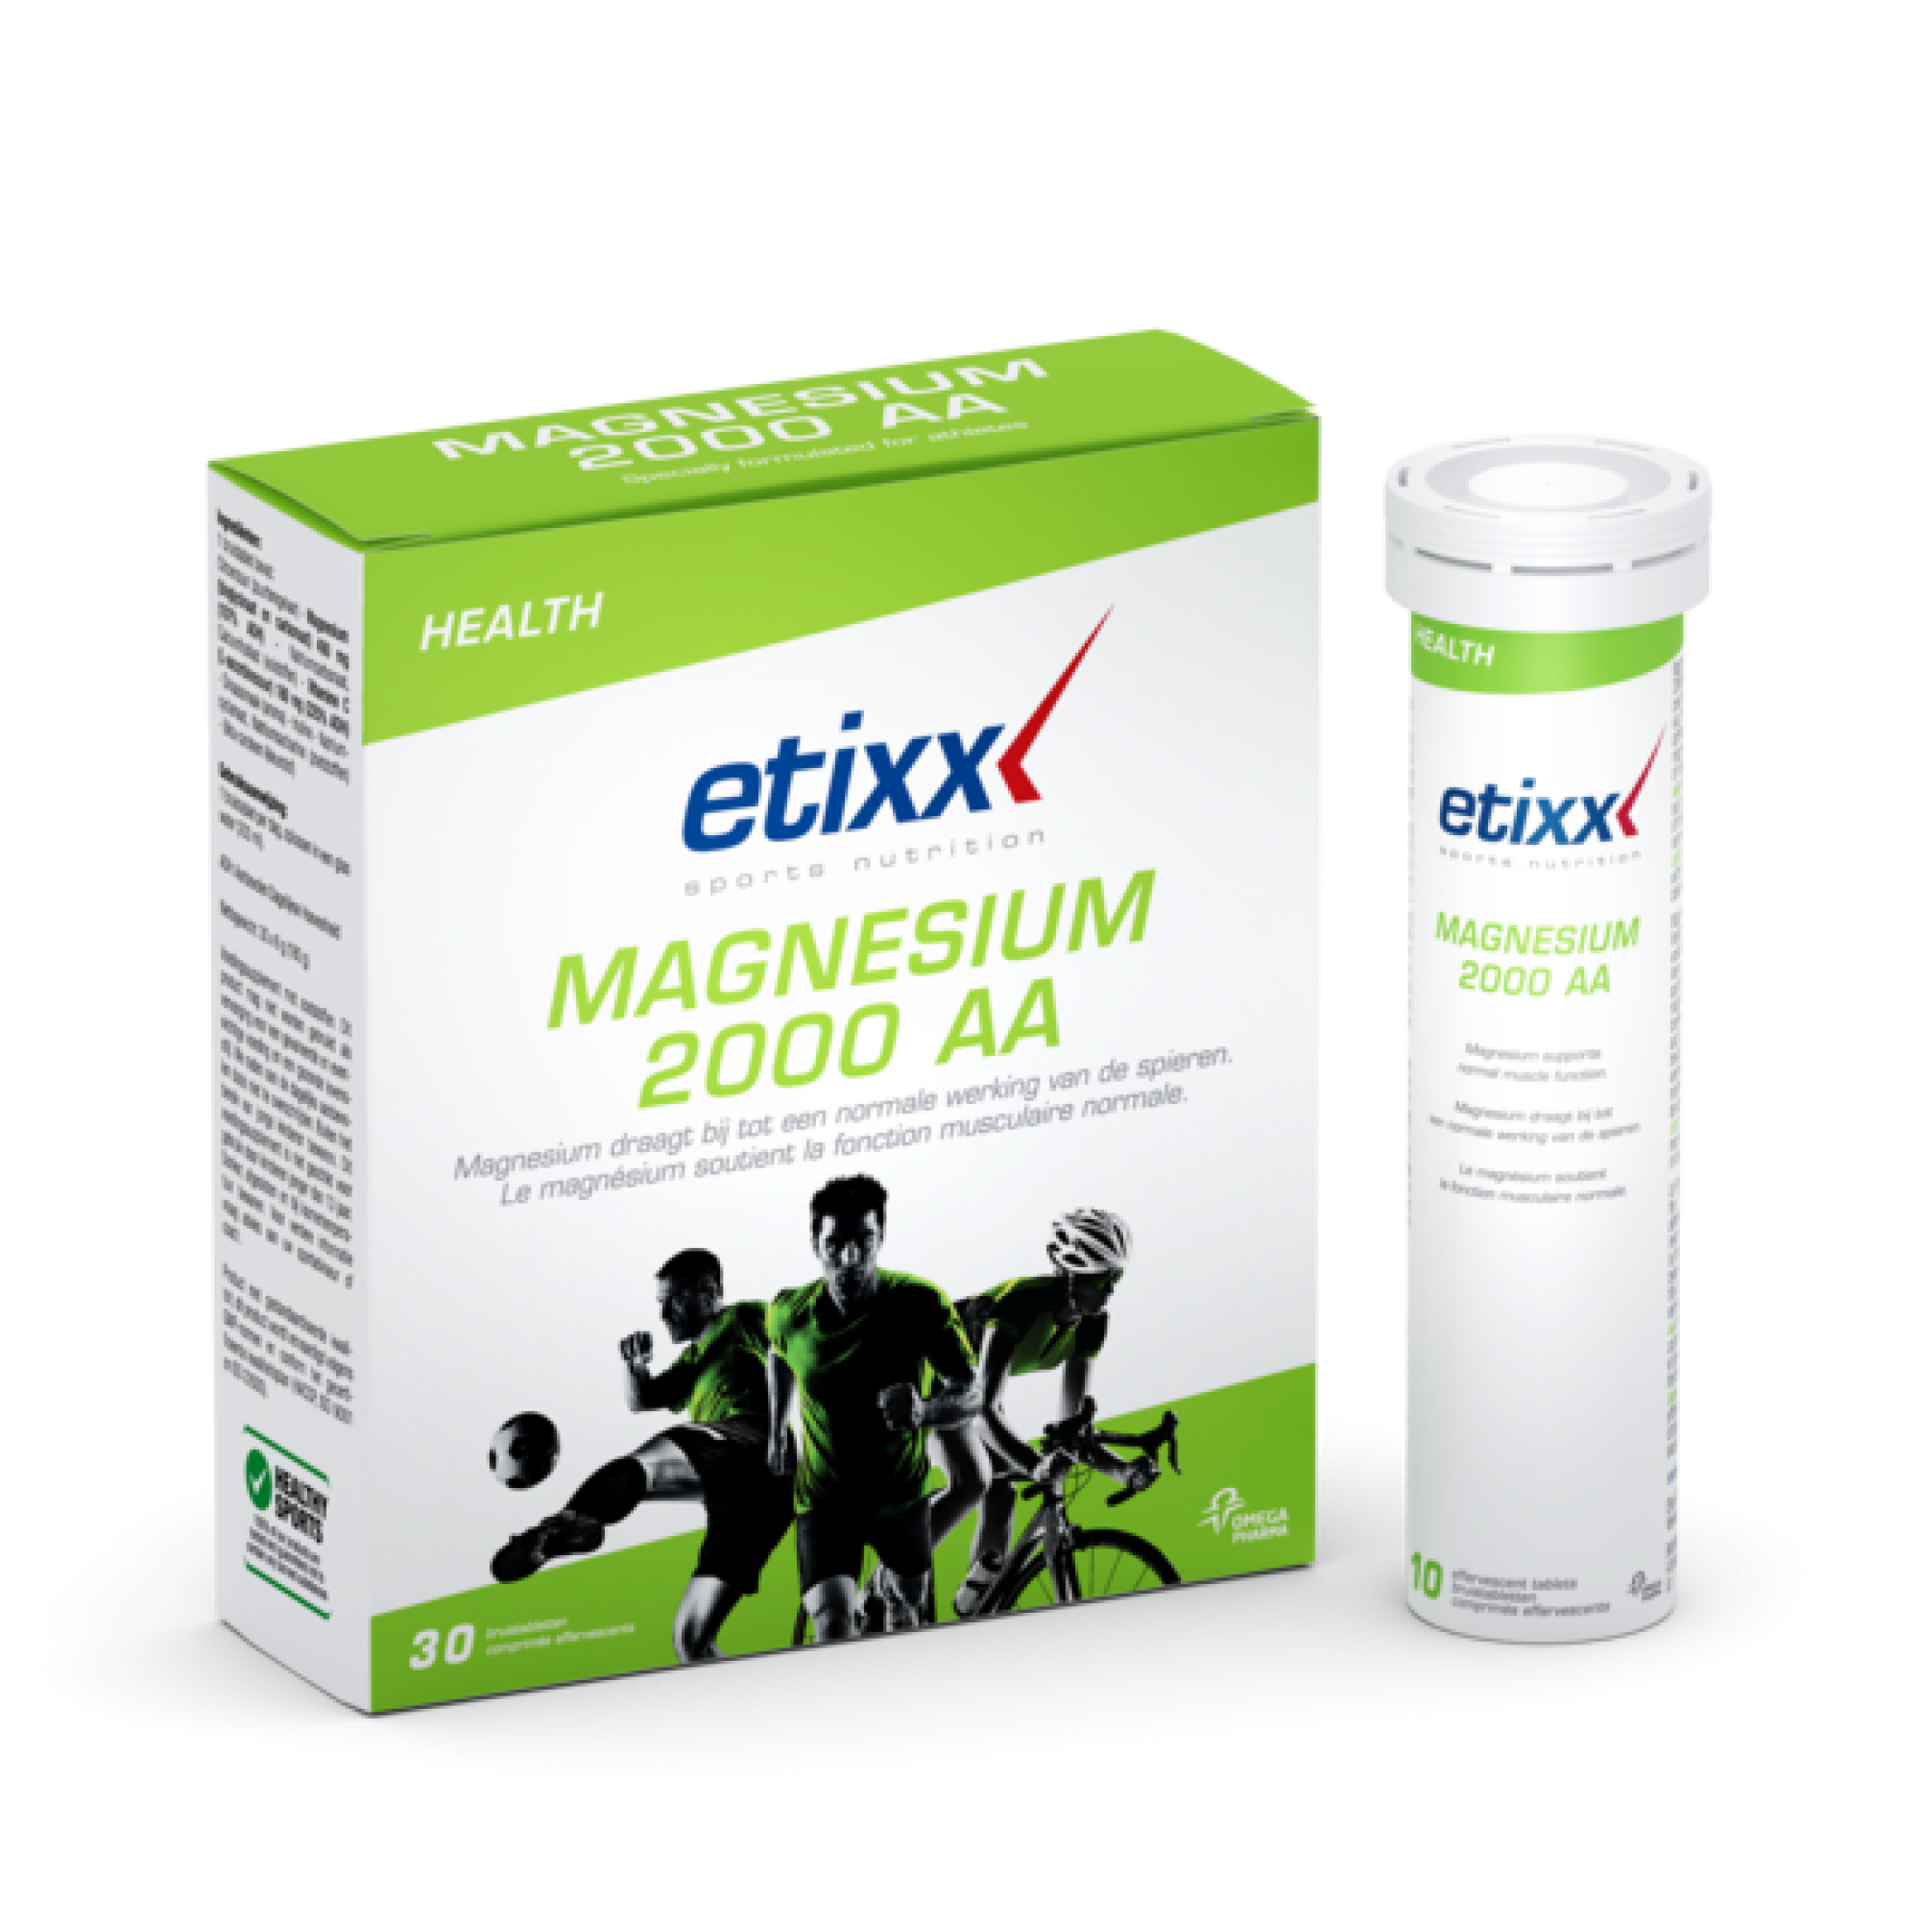 TABLETKI ETIXX MAGNESIUM 2000 AA POMARAŃCZOWY 1